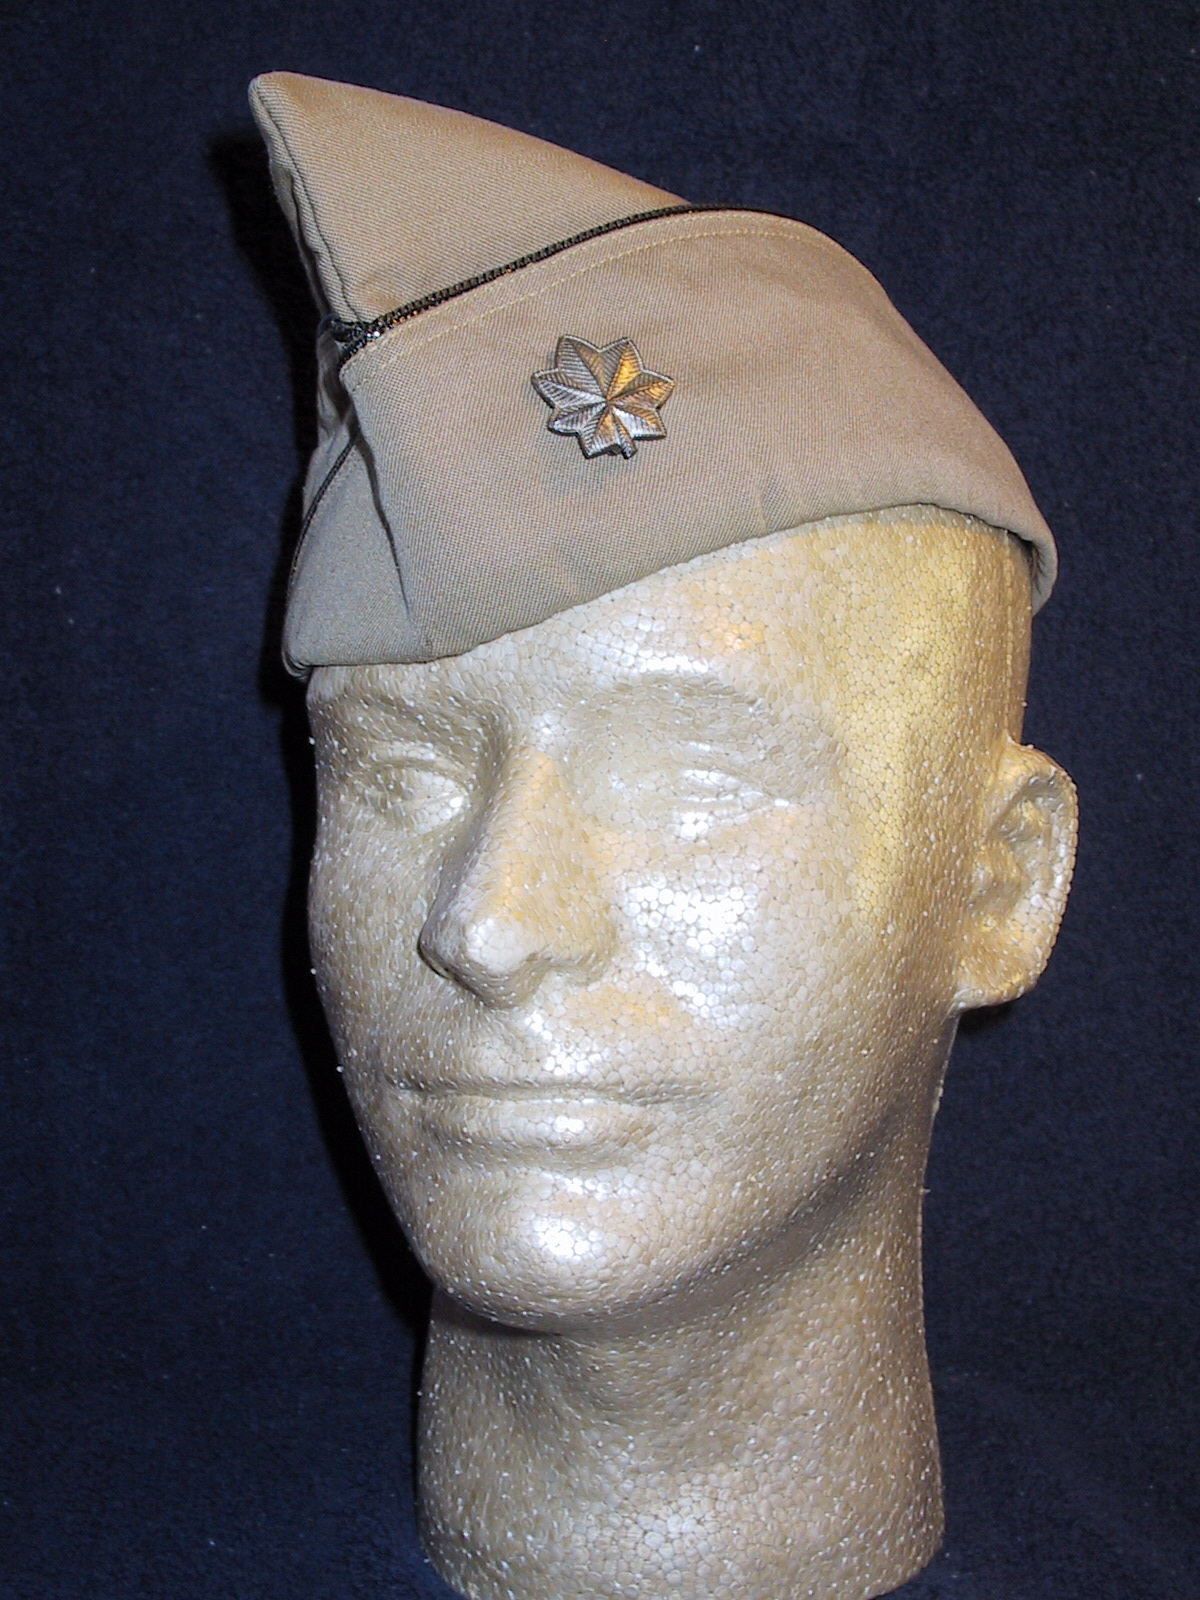 Us Army Hat Types - Hat HD Image Ukjugs.Org d3fc074ec6a